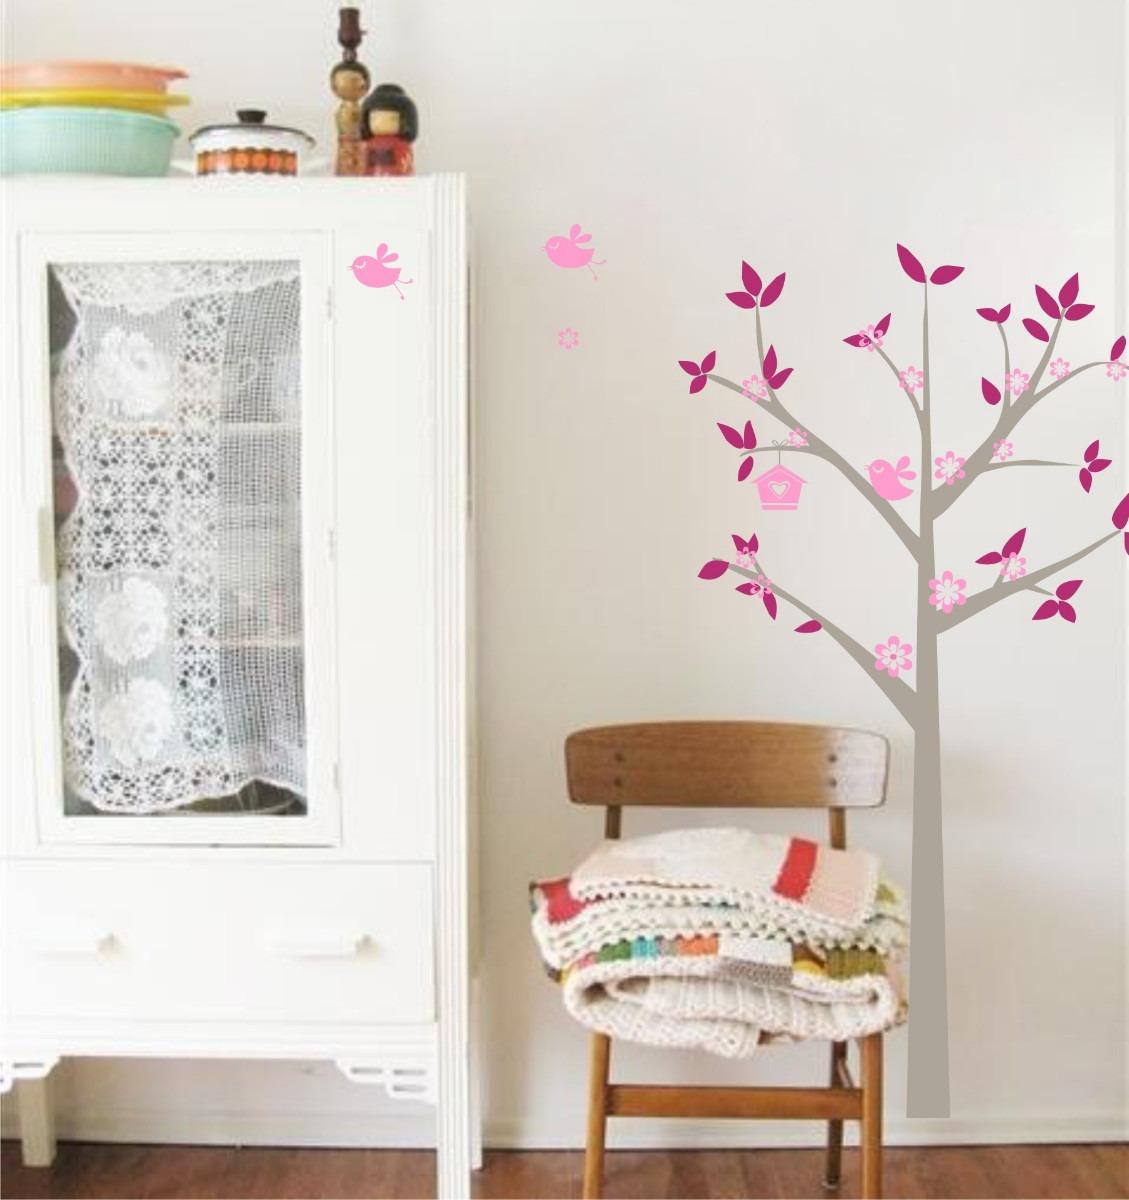 Vinilos decorativos interiores por paulina aguirre for Vinilos para paredes exteriores